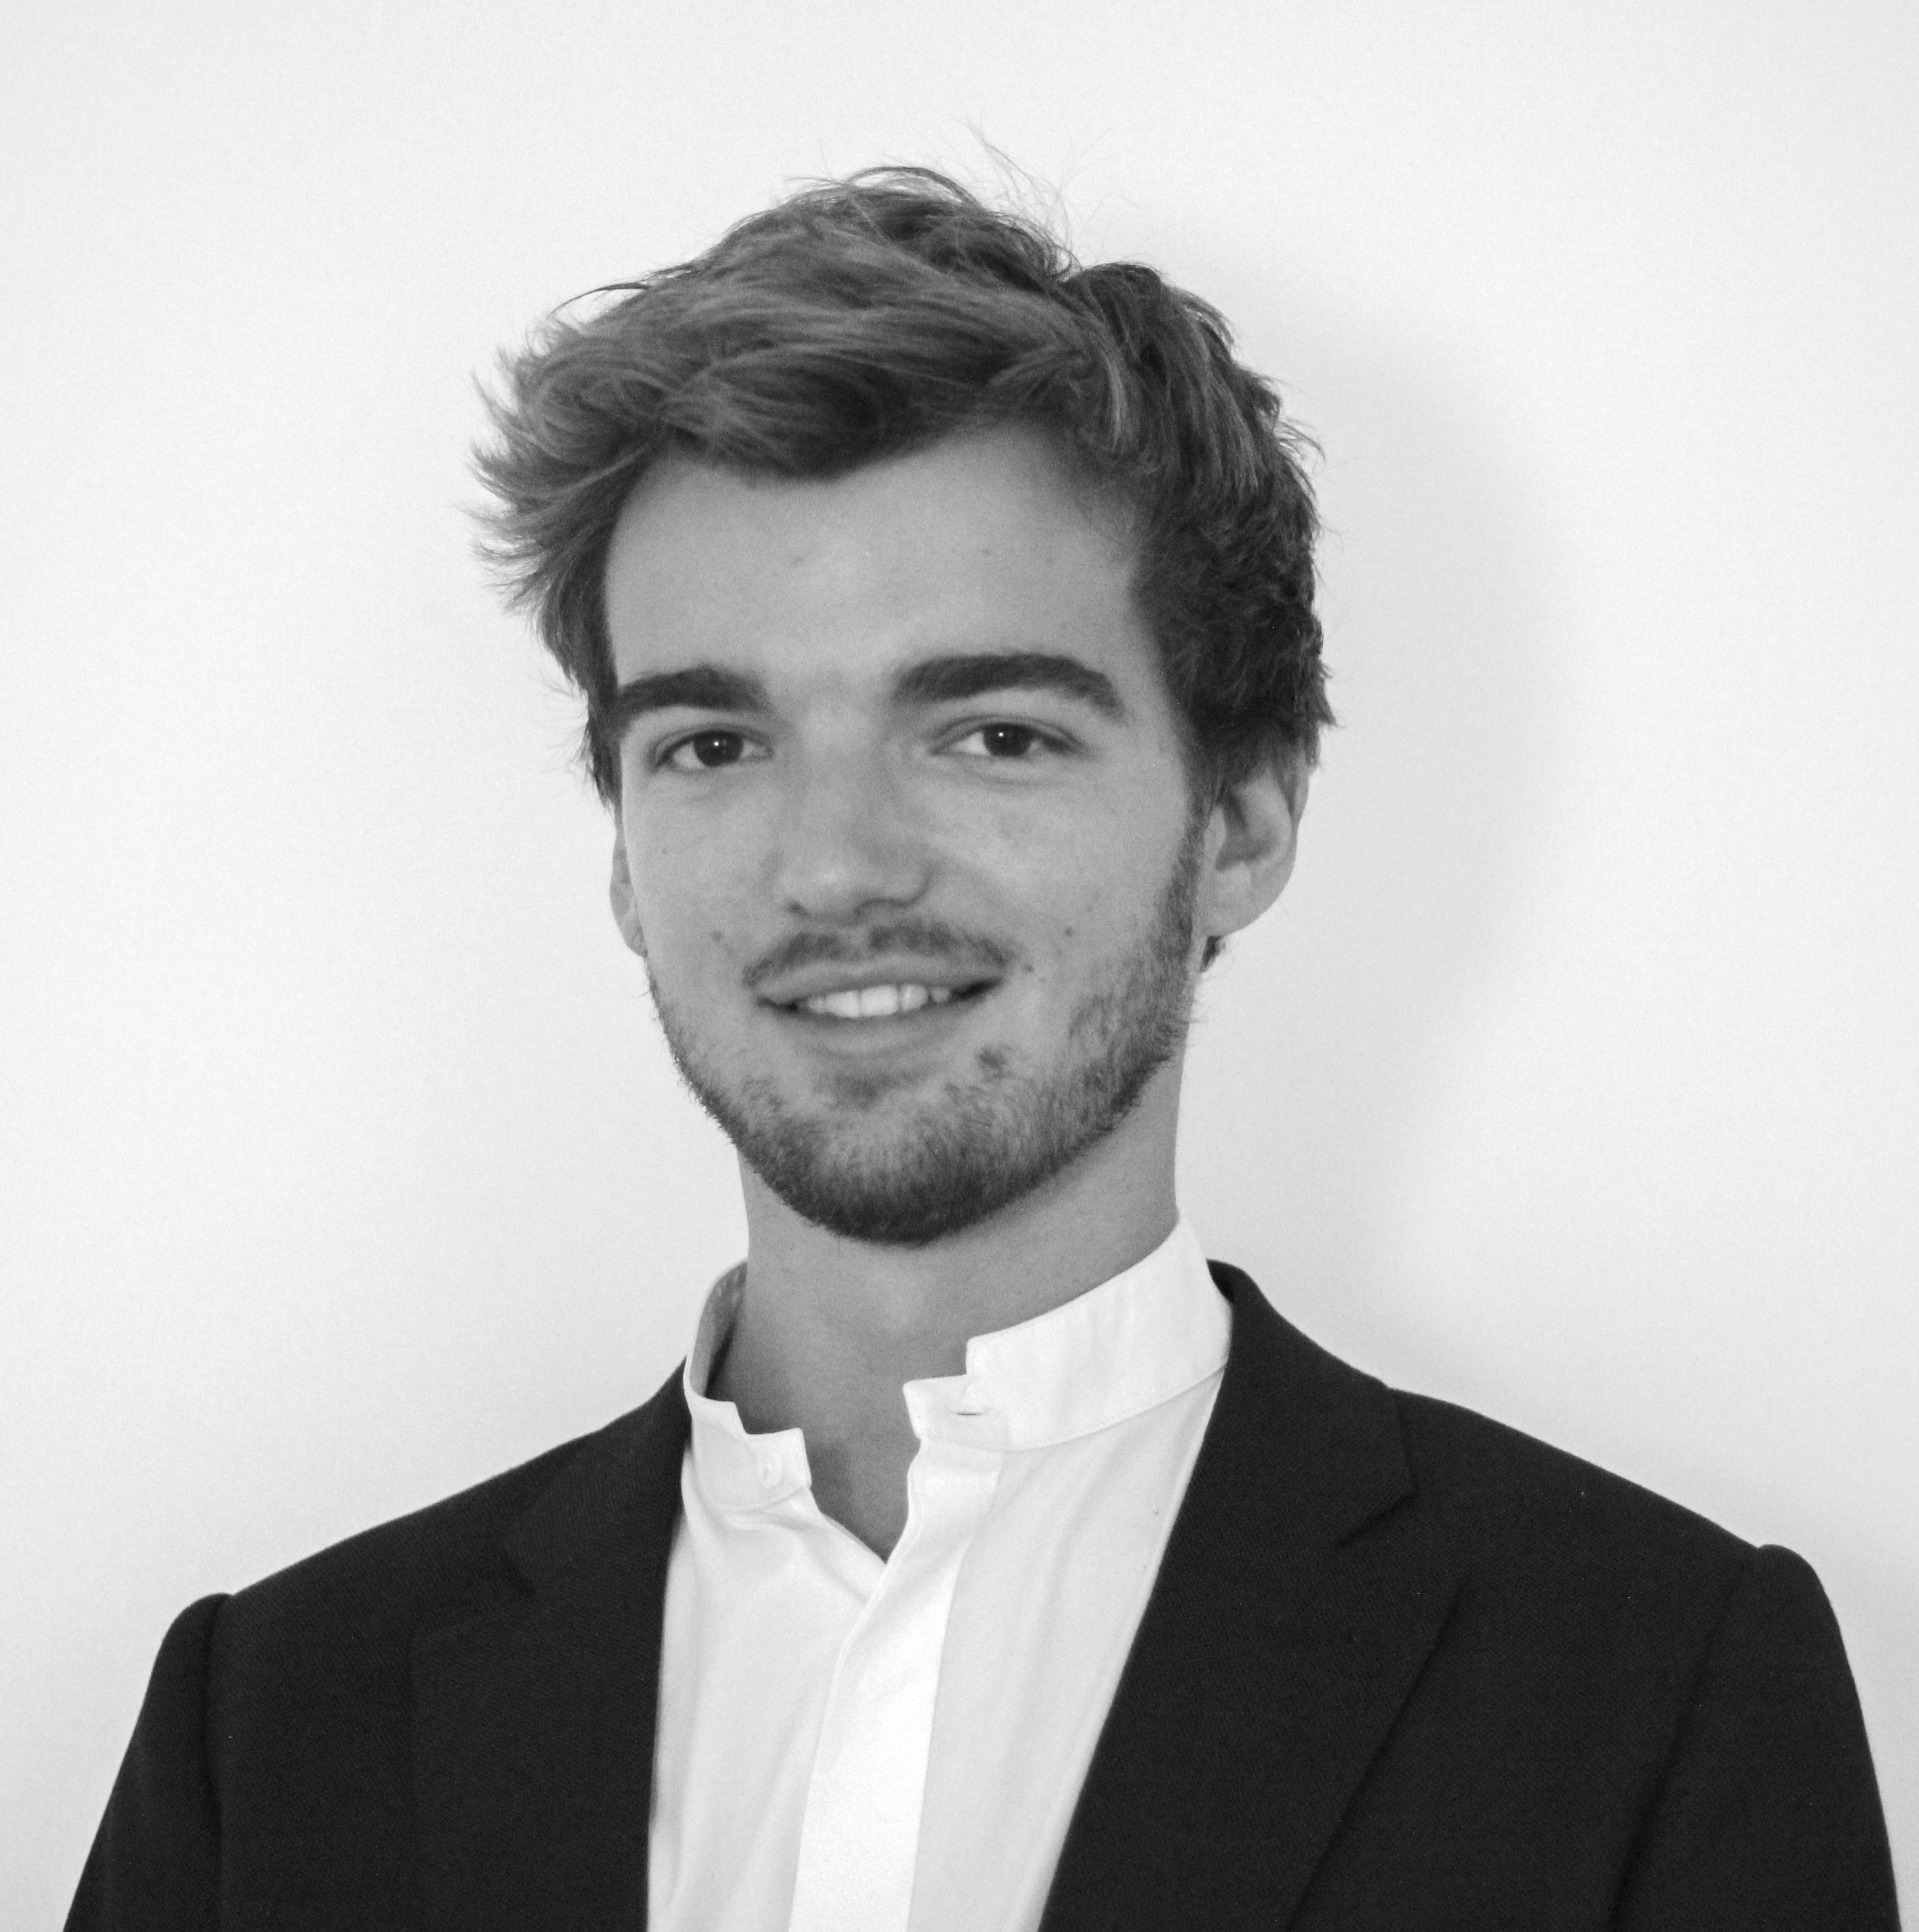 Damien Authier